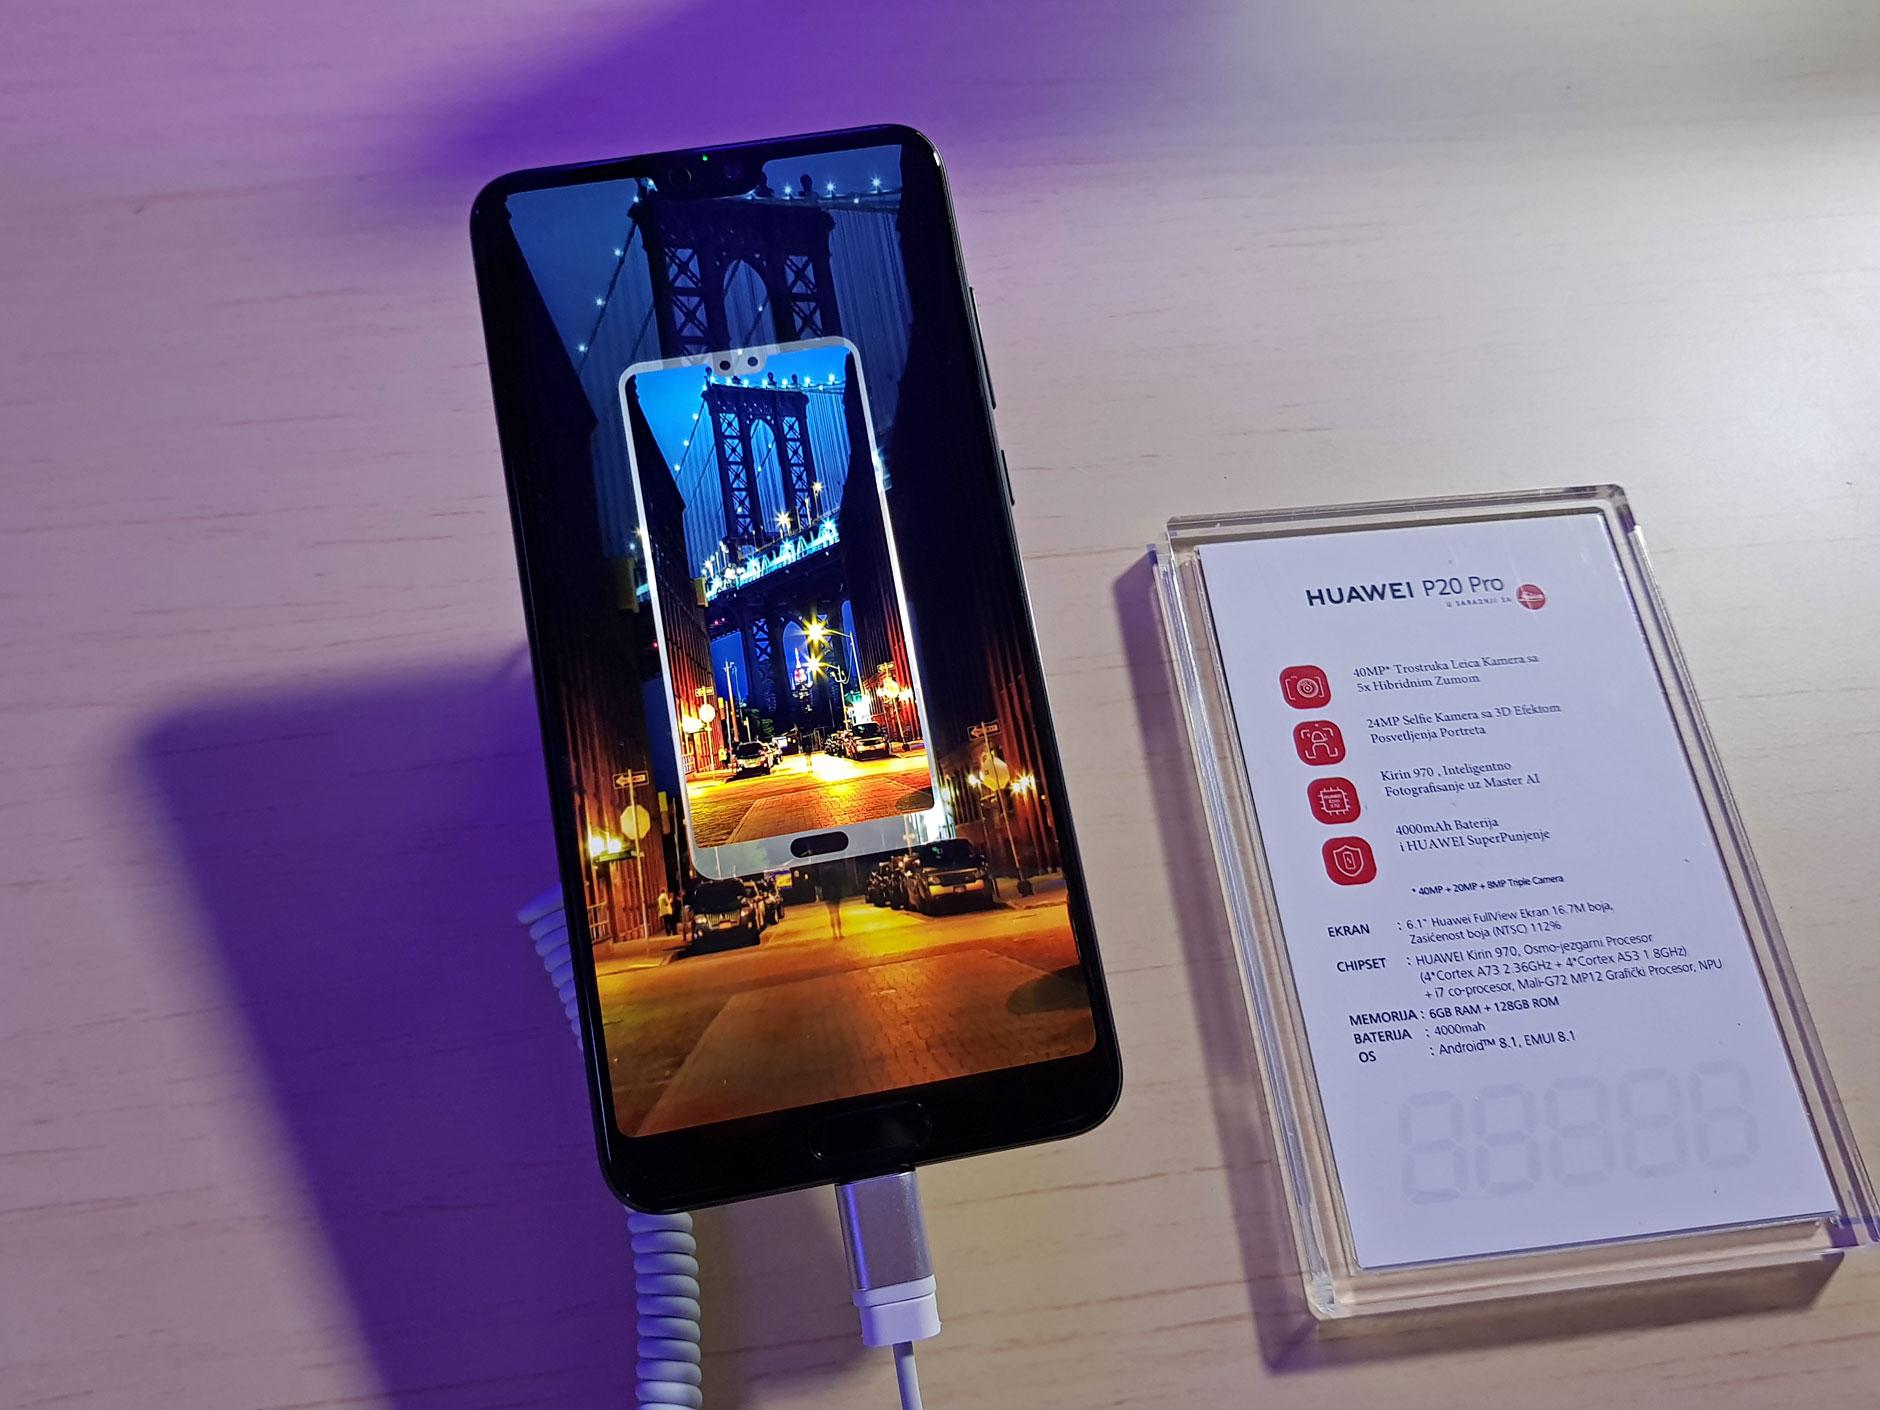 Huawei P20 Pro; Prednja strana telefona i specifikacije